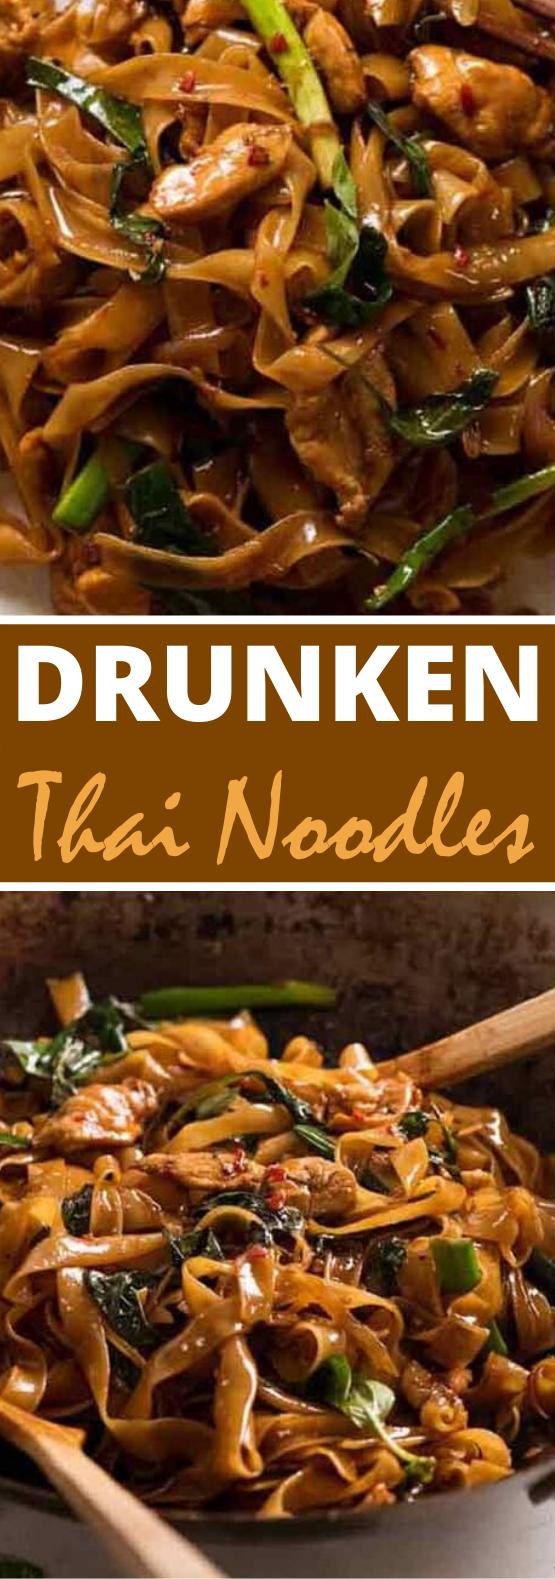 Thai Drunken Noodles (Pad Kee Mao) #dinner #recipes #noodles #thai #takeout